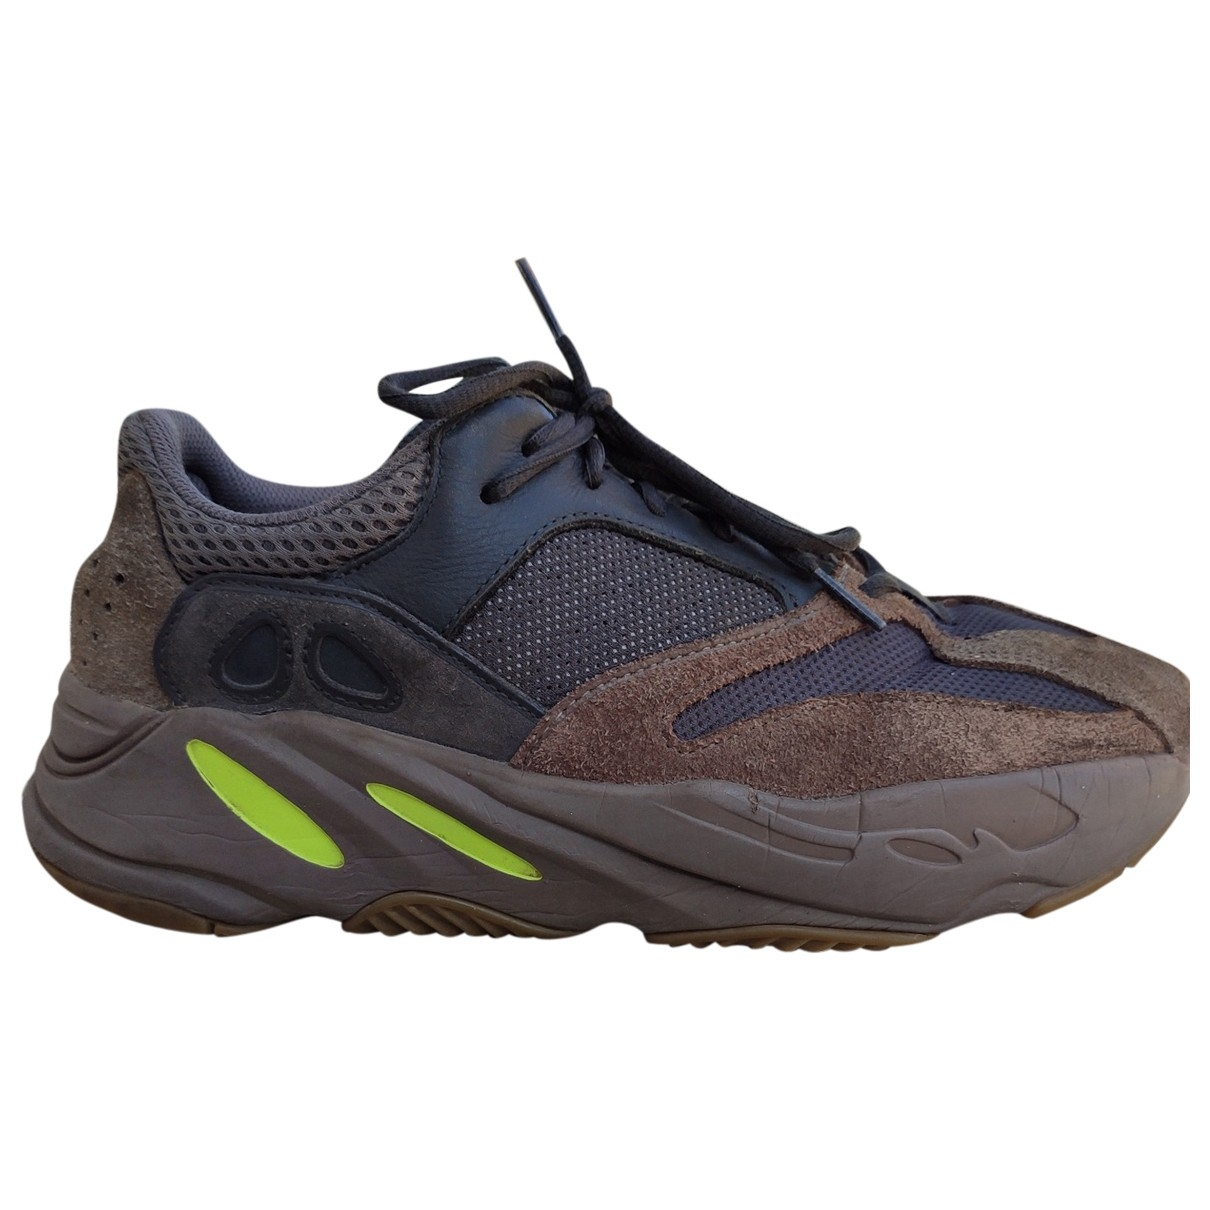 Yeezy X Adidas - Baskets Boost 700 V1  pour homme en toile - marron